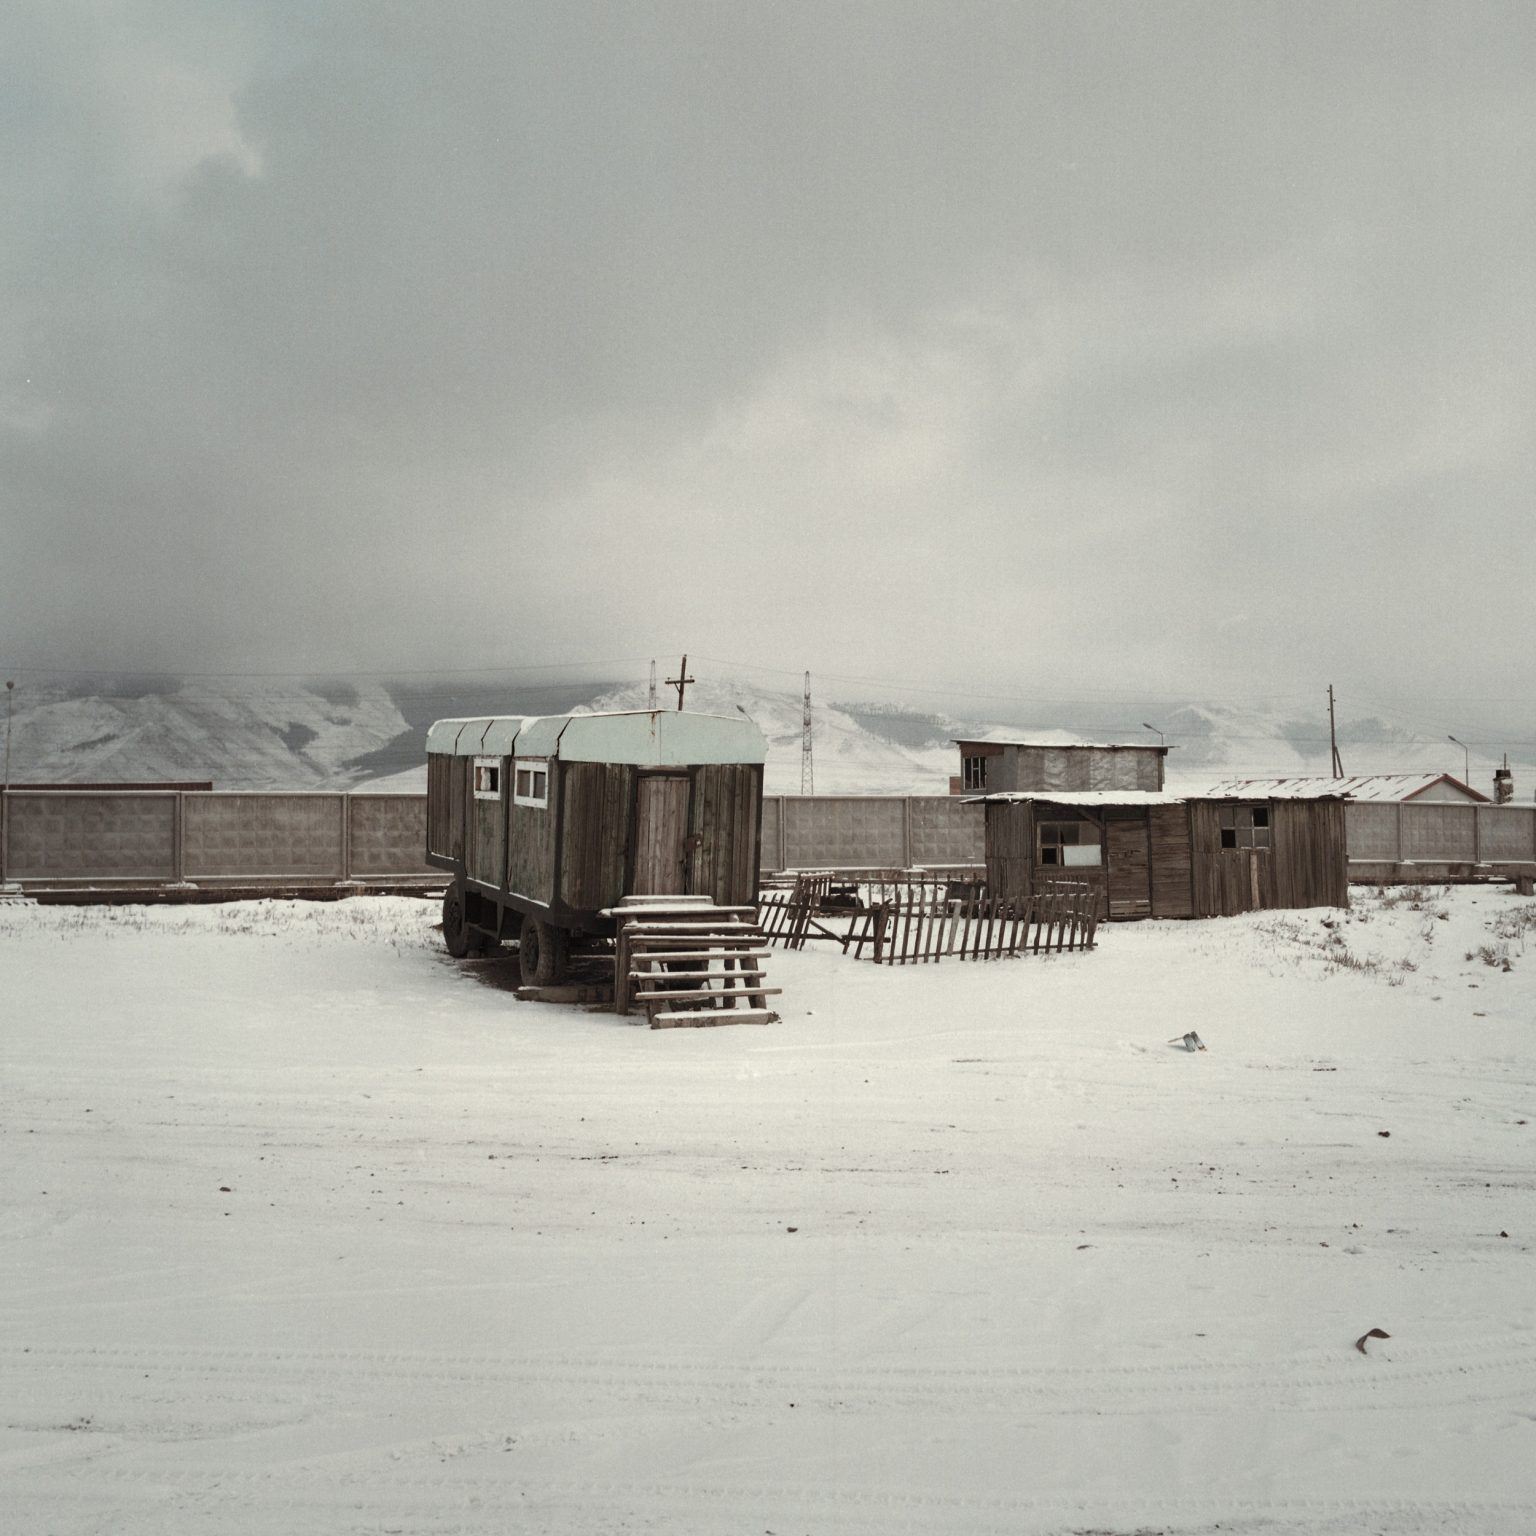 Mongolia, Ulaanbaatar, novembre 2013  Zona industriale